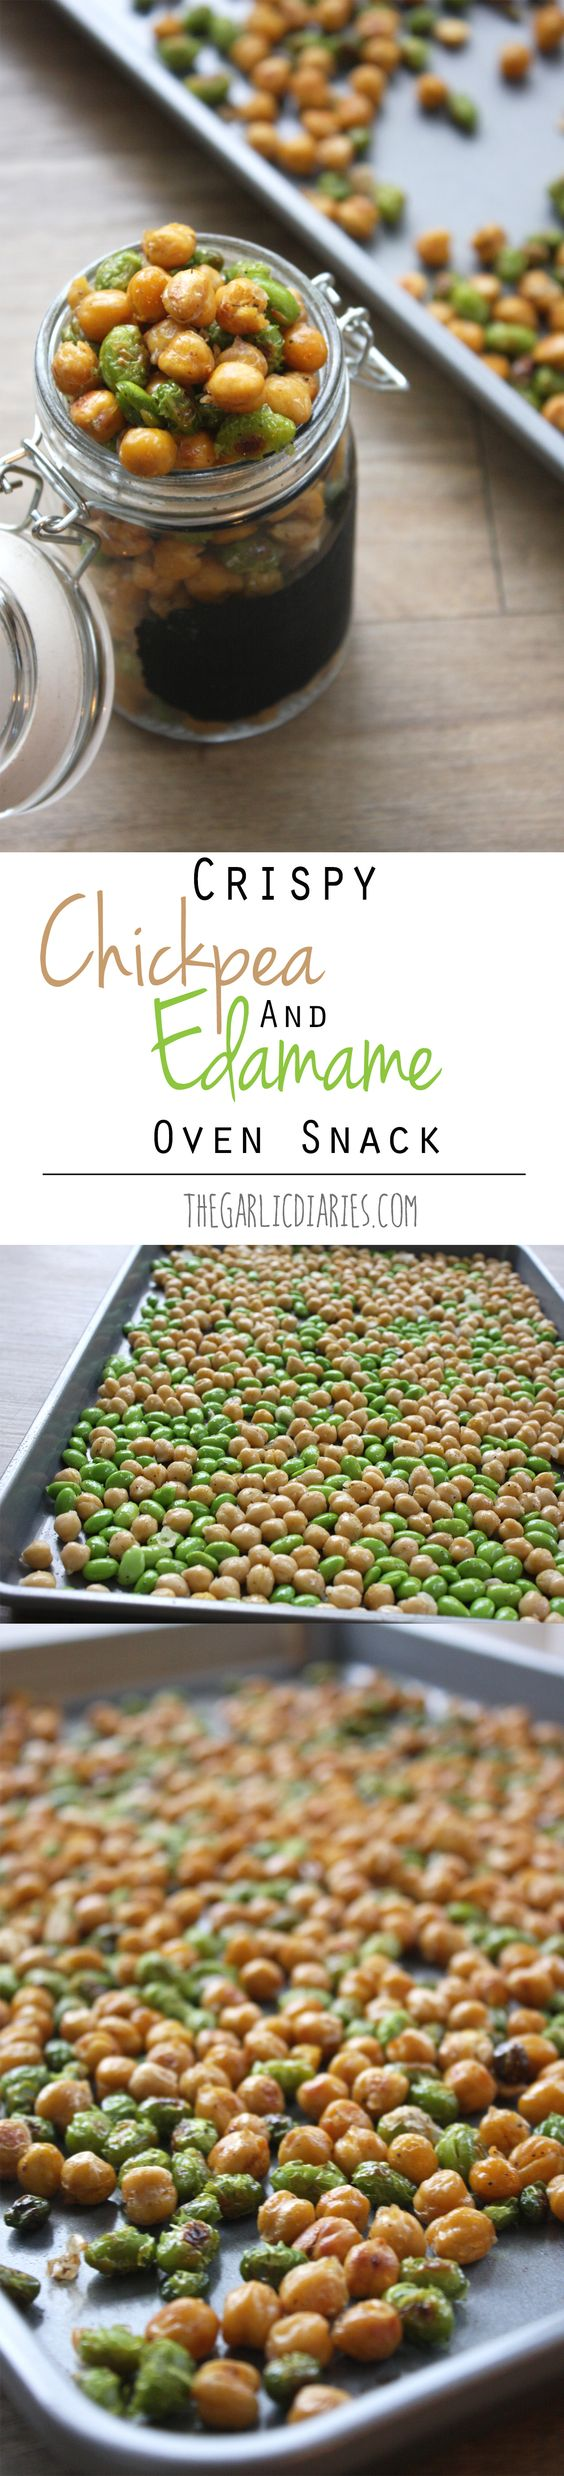 Crispy Chickpea and Edamame Oven Snack TheGarlicDiaries.com                                                                                                                            More